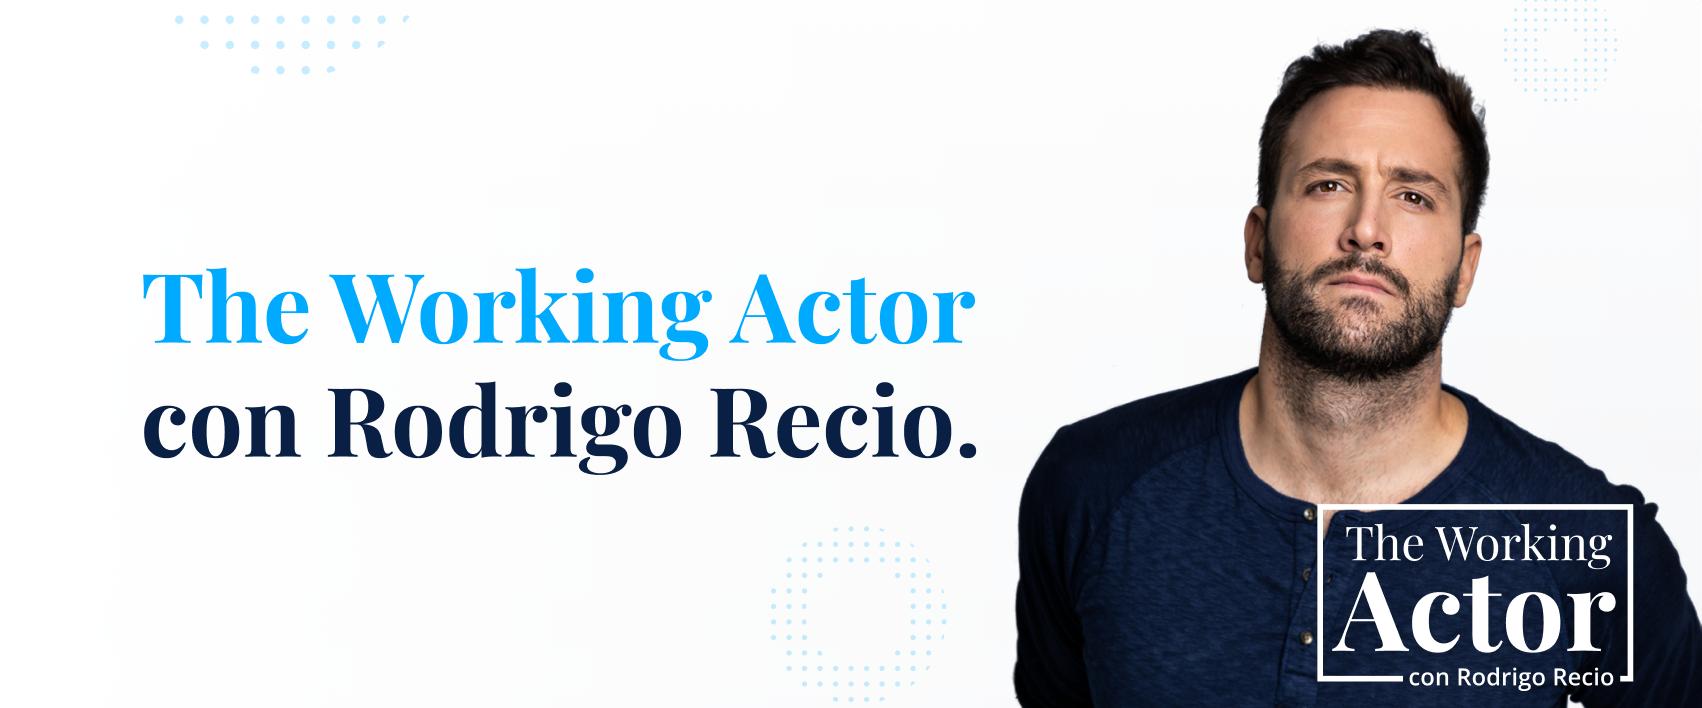 The Working Actor with Rodrigo Recio